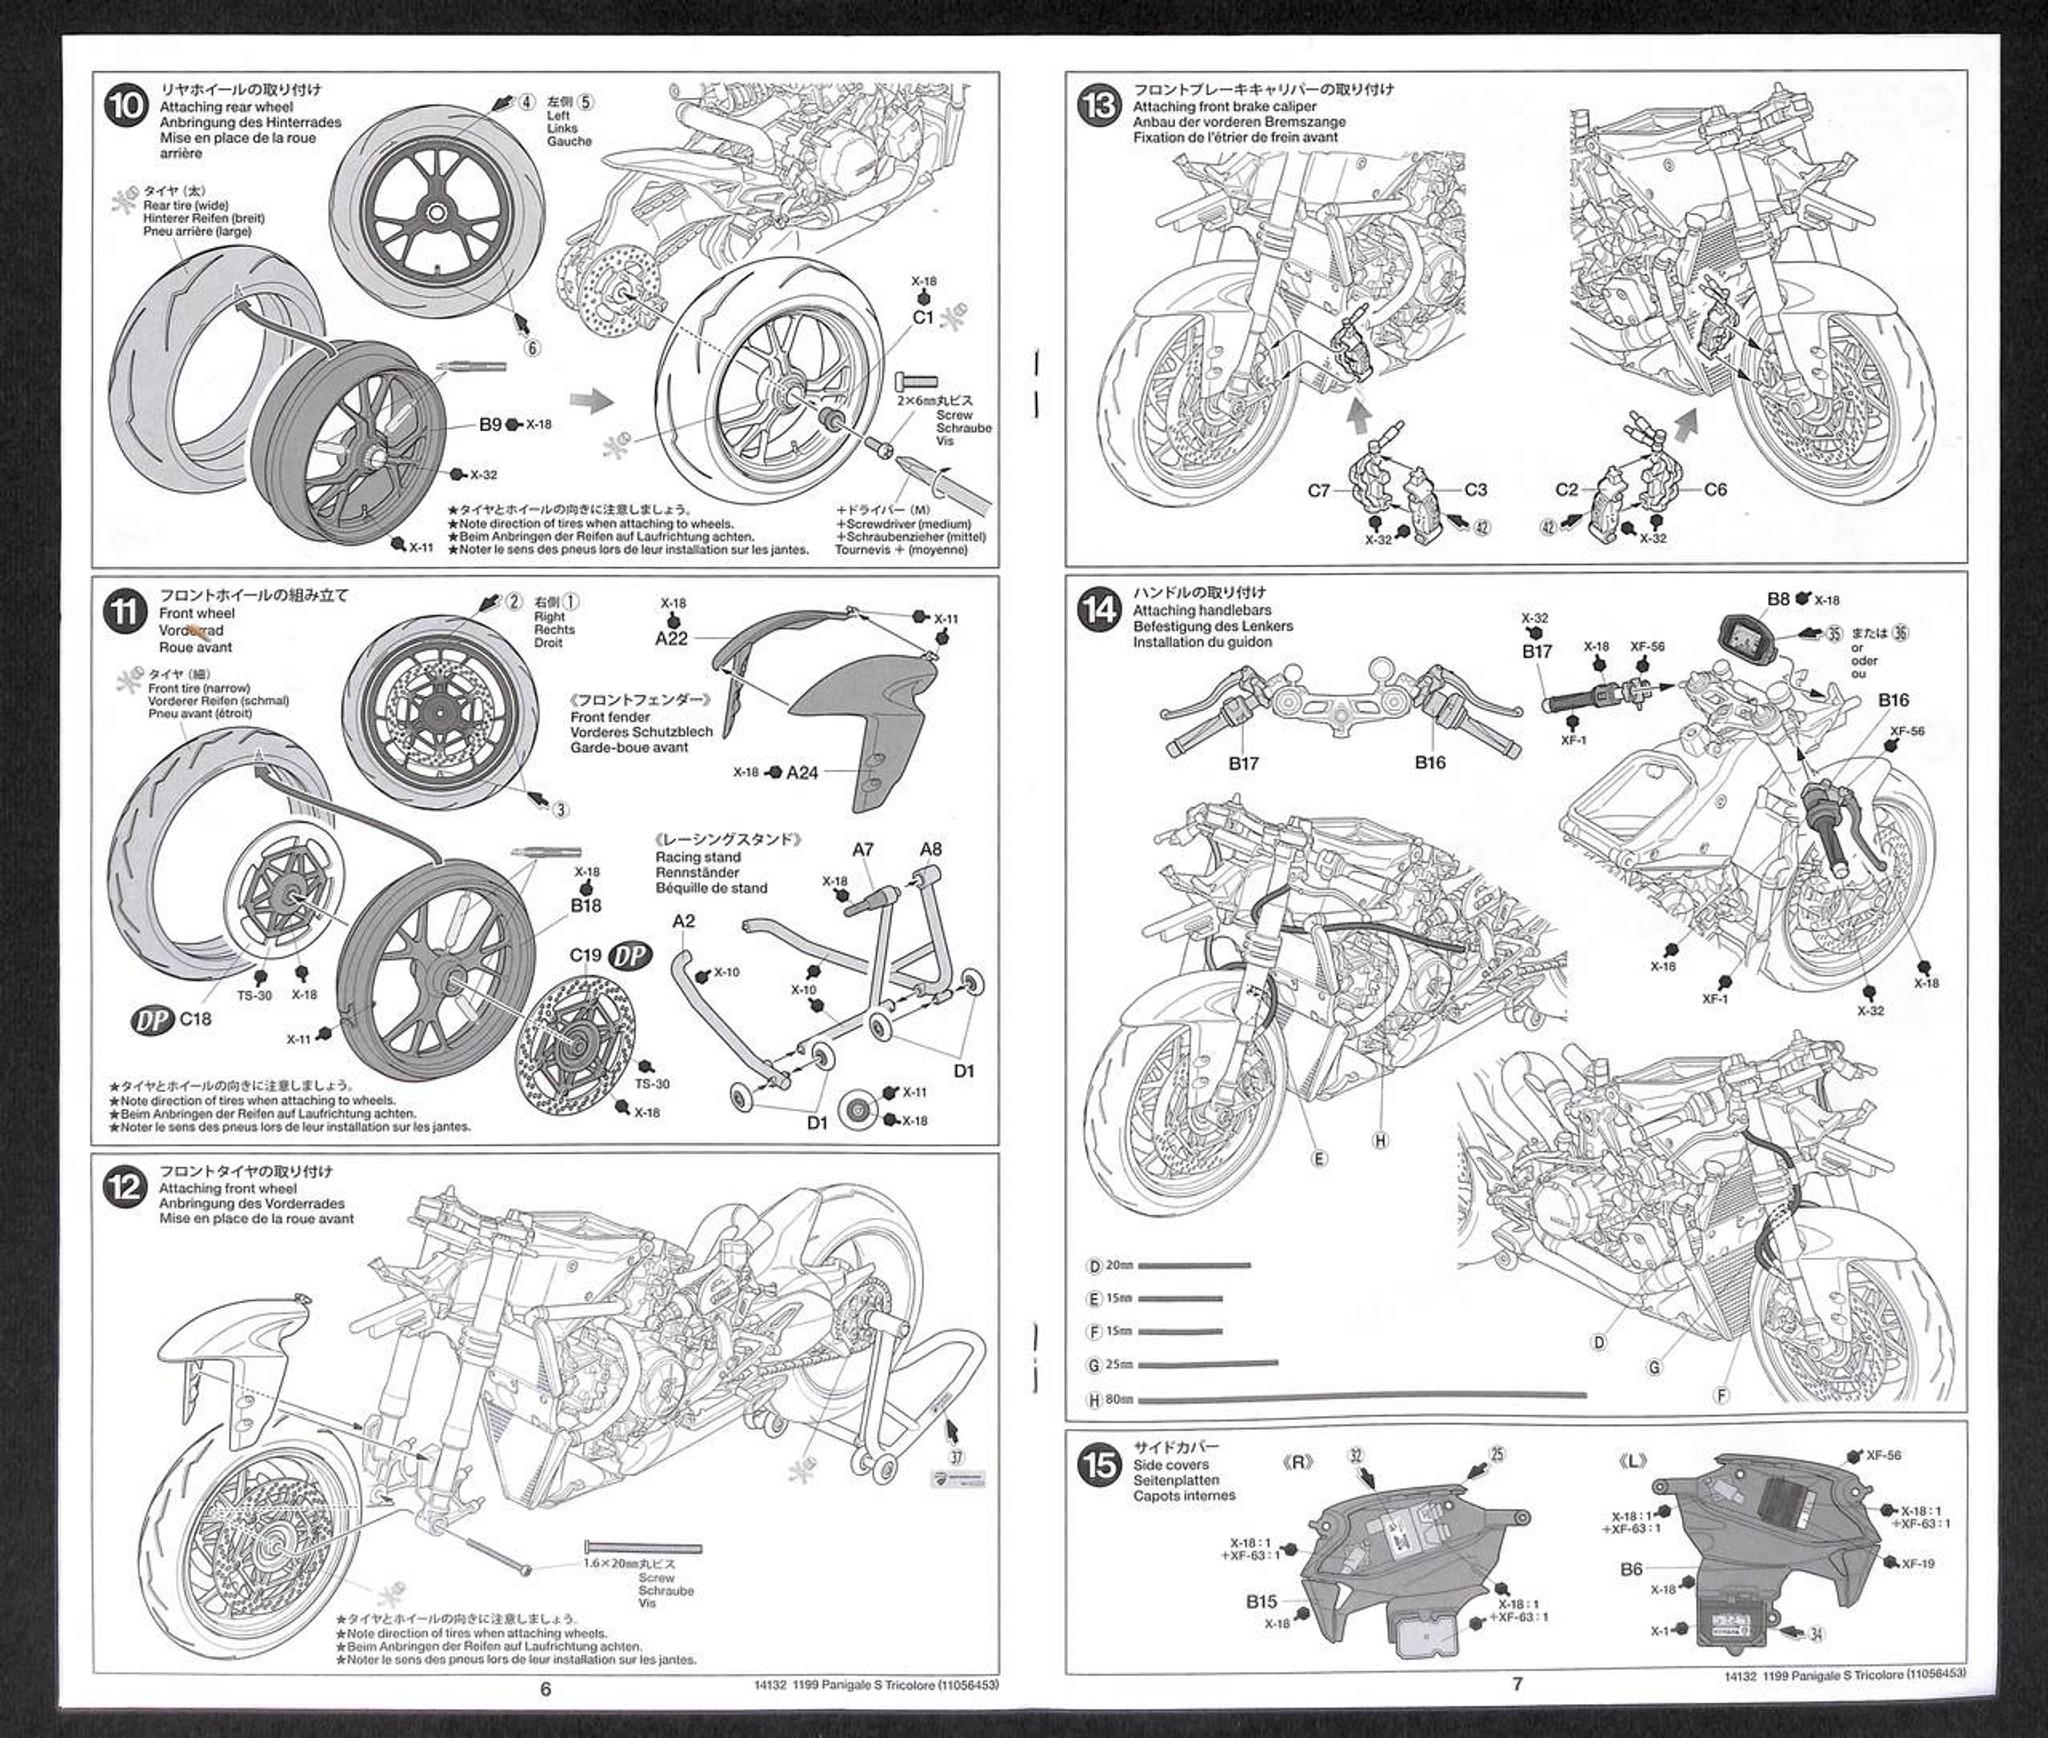 Tamiya Ducati 1199 Panigale S Tricolore 1 12kit Plazajapan Scale Kits Desmosedici 14132 12 Kit